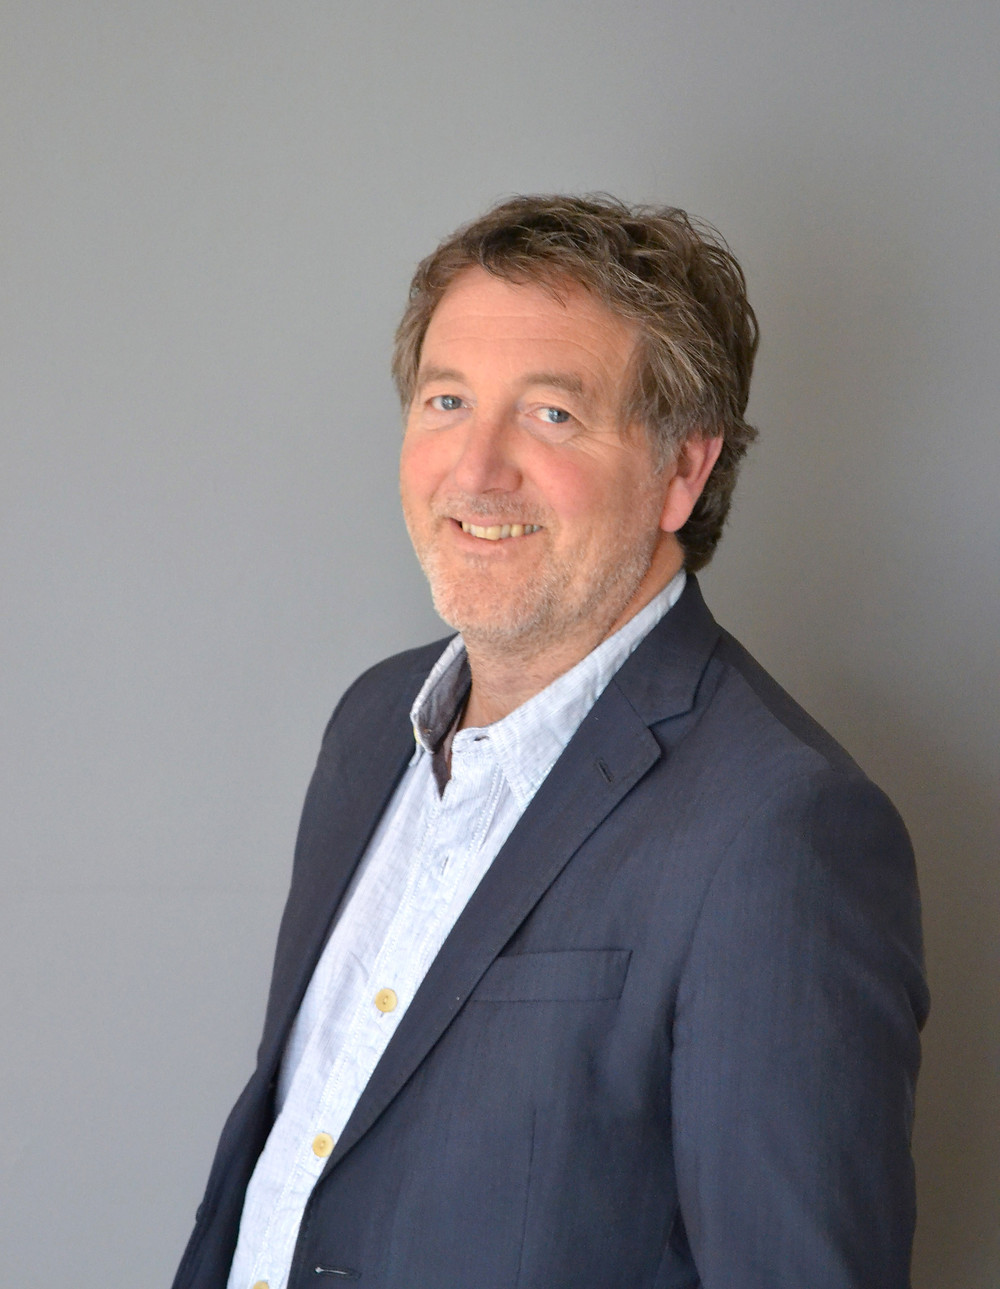 David Critchley, CEO 4EI